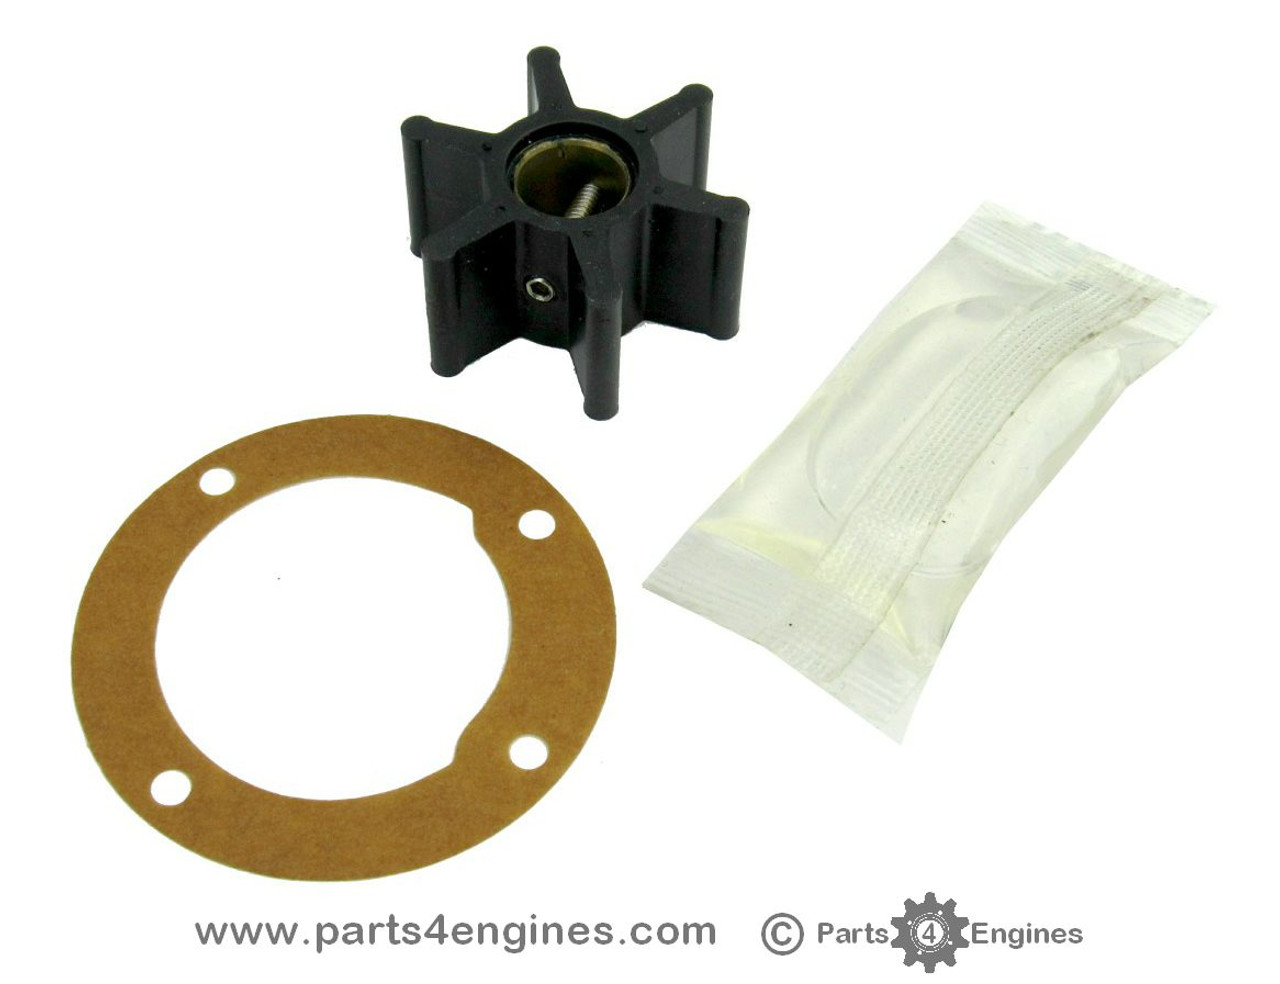 Volvo Penta 2003 raw water pump impeller kit - Parts4engines.com